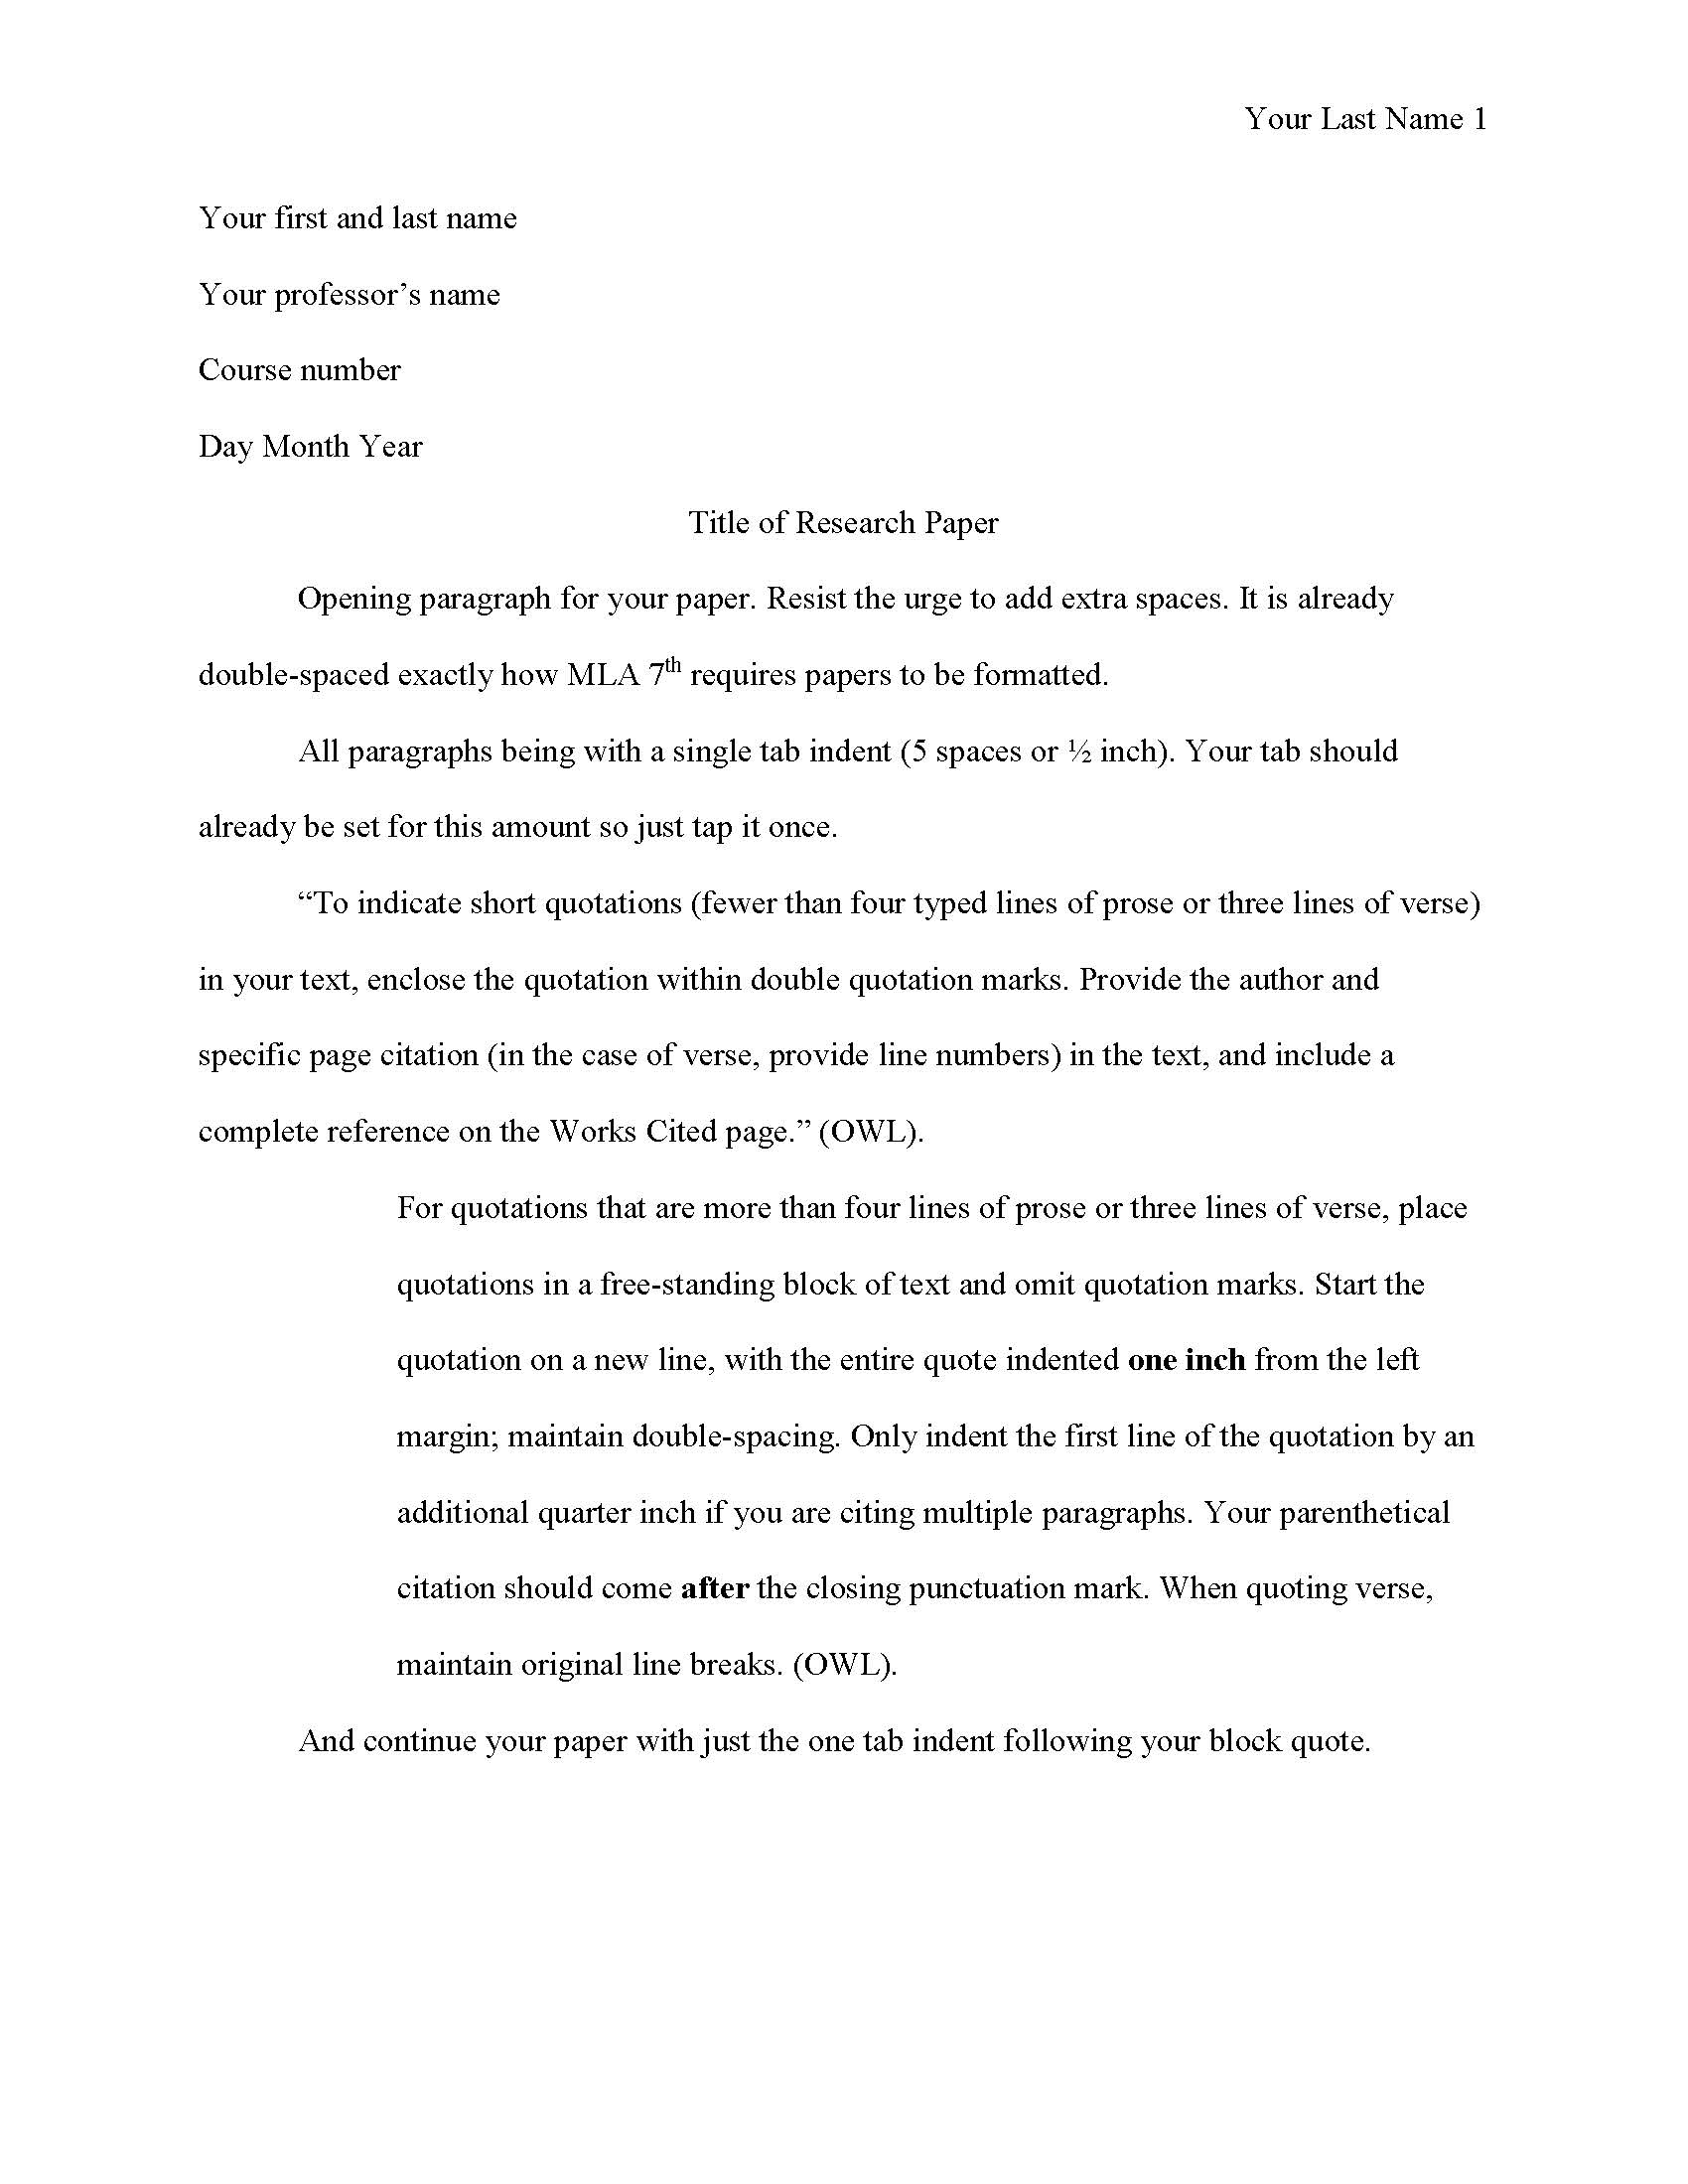 MLA Paper example